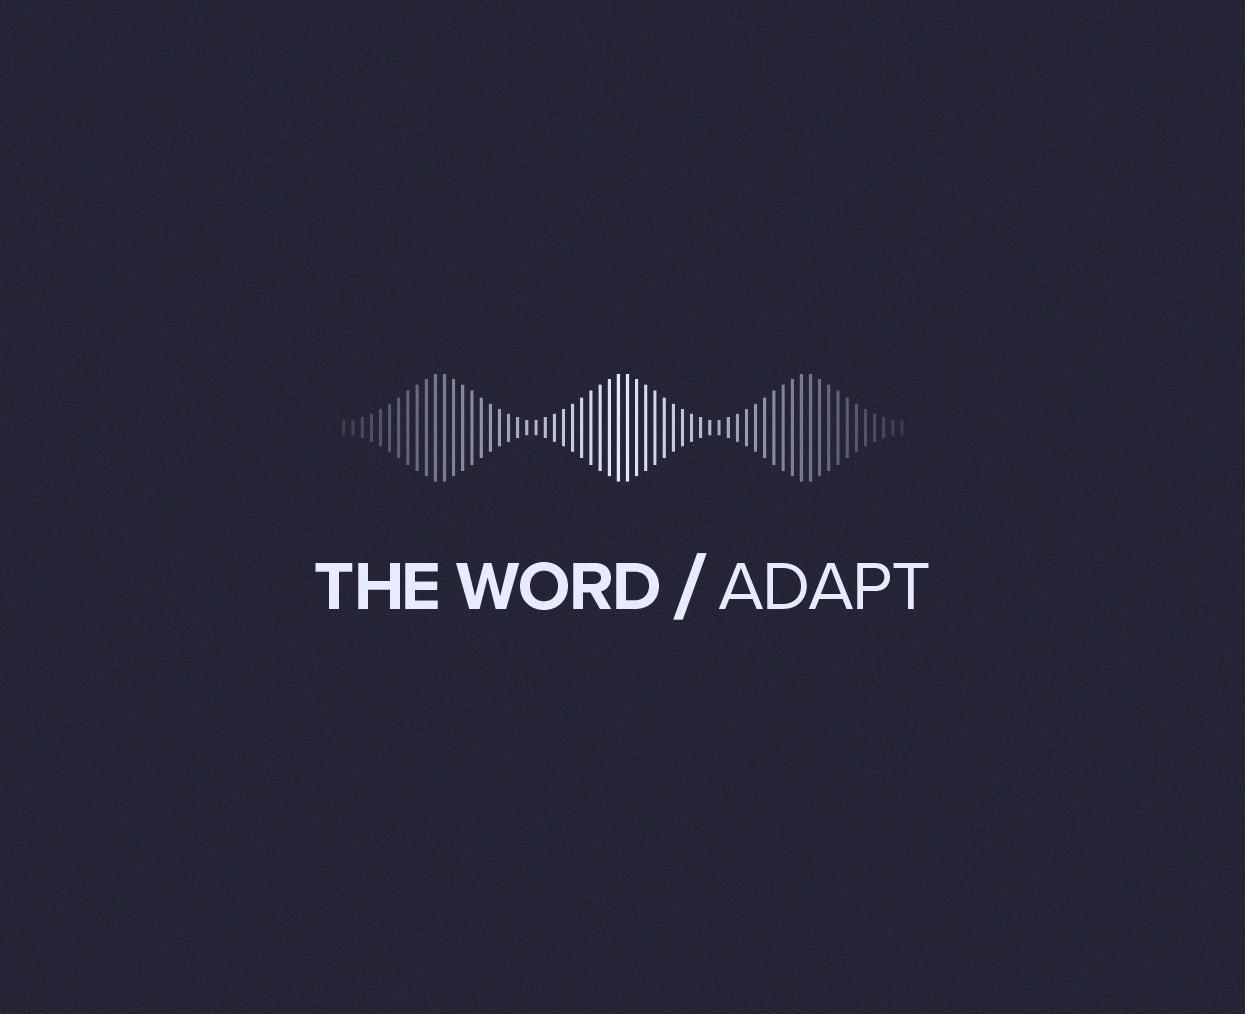 THE WORD/Adapt podcast hero image